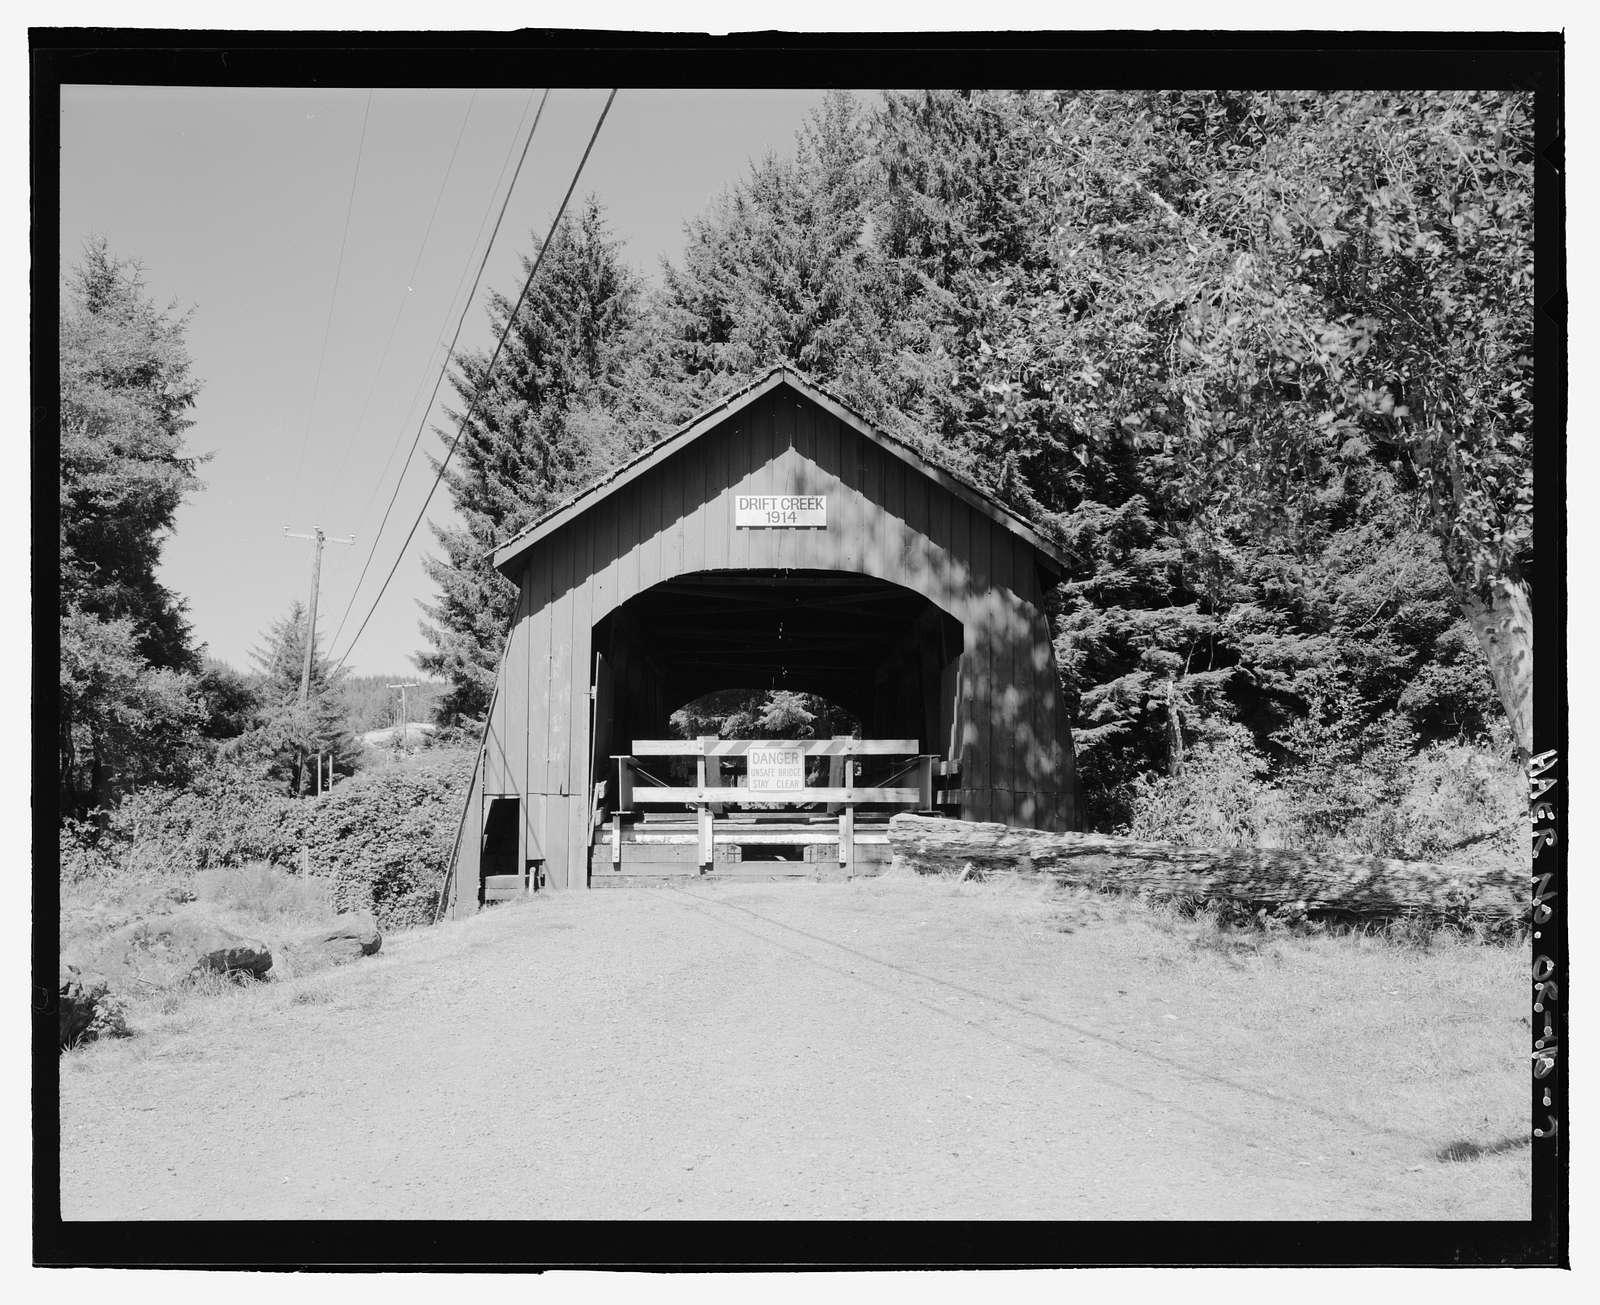 Drift Creek Bridge, Spanning Drift Creek on Drift Creek County Road, Lincoln City, Lincoln County, OR